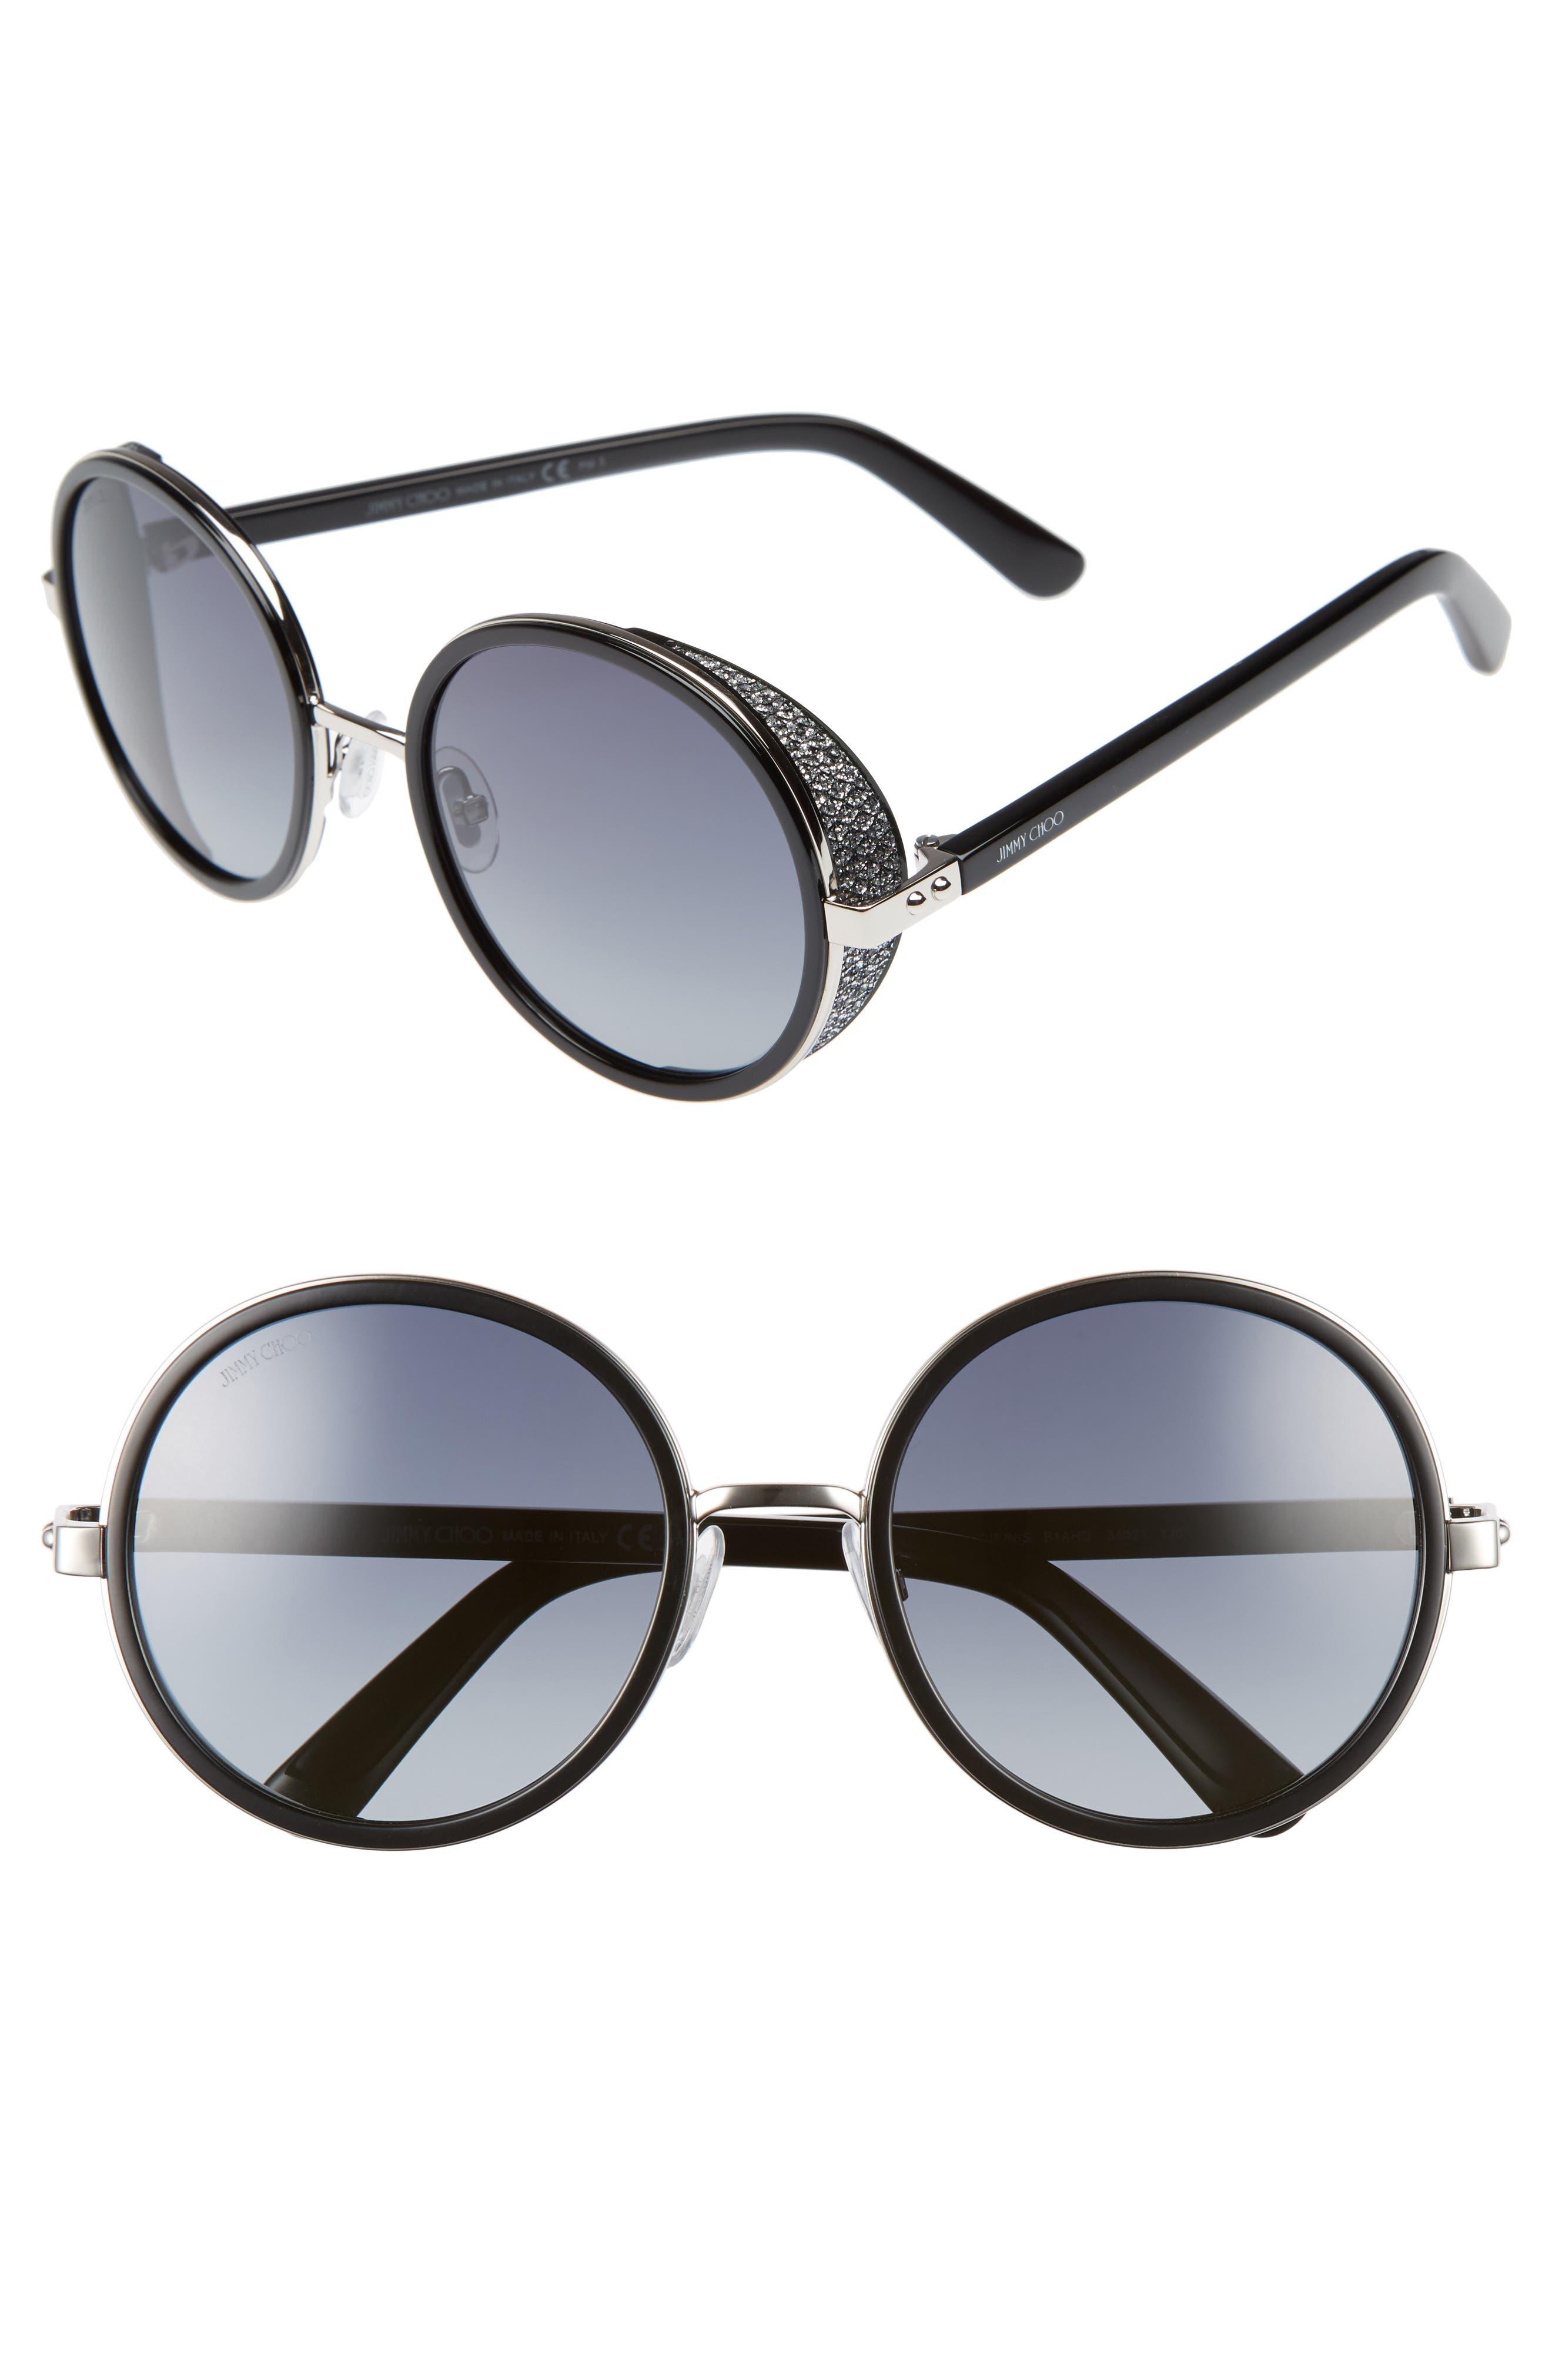 Andiens 54mm Round Sunglasses,                             Main thumbnail 1, color,                             Palladium/ Black